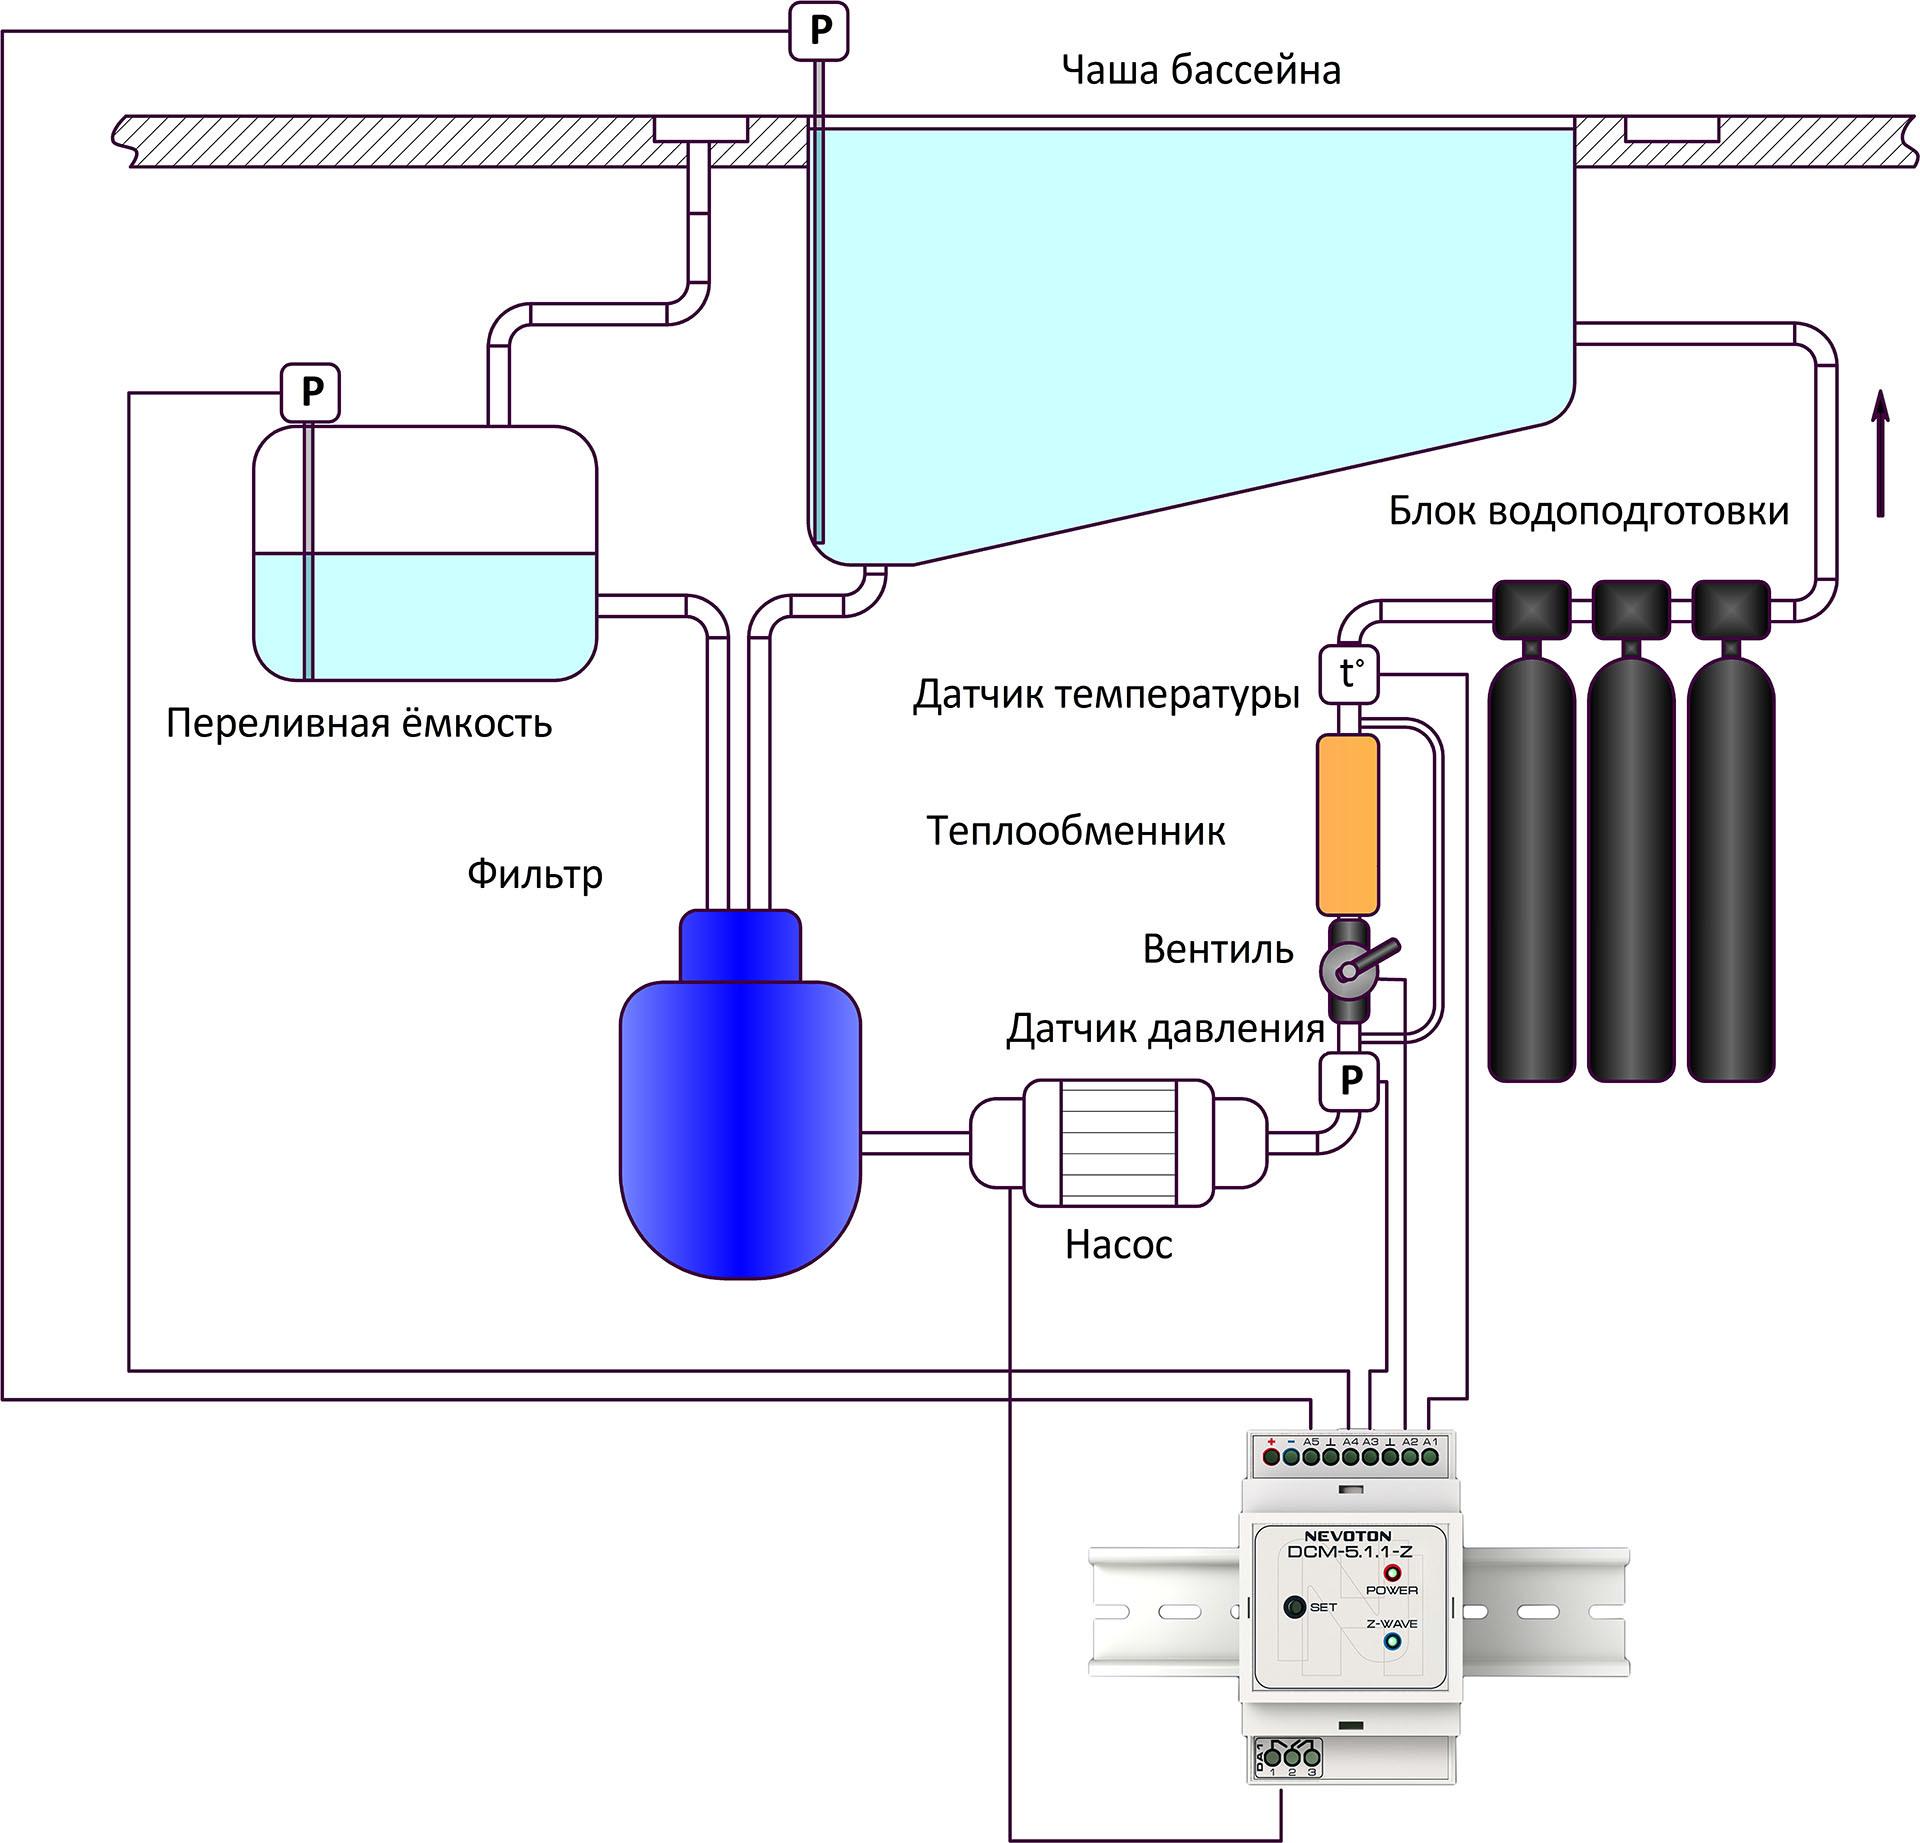 Автоматизация бассейна с модулем сбора данных NEVOTON DMC-5.1.1-Z - 1